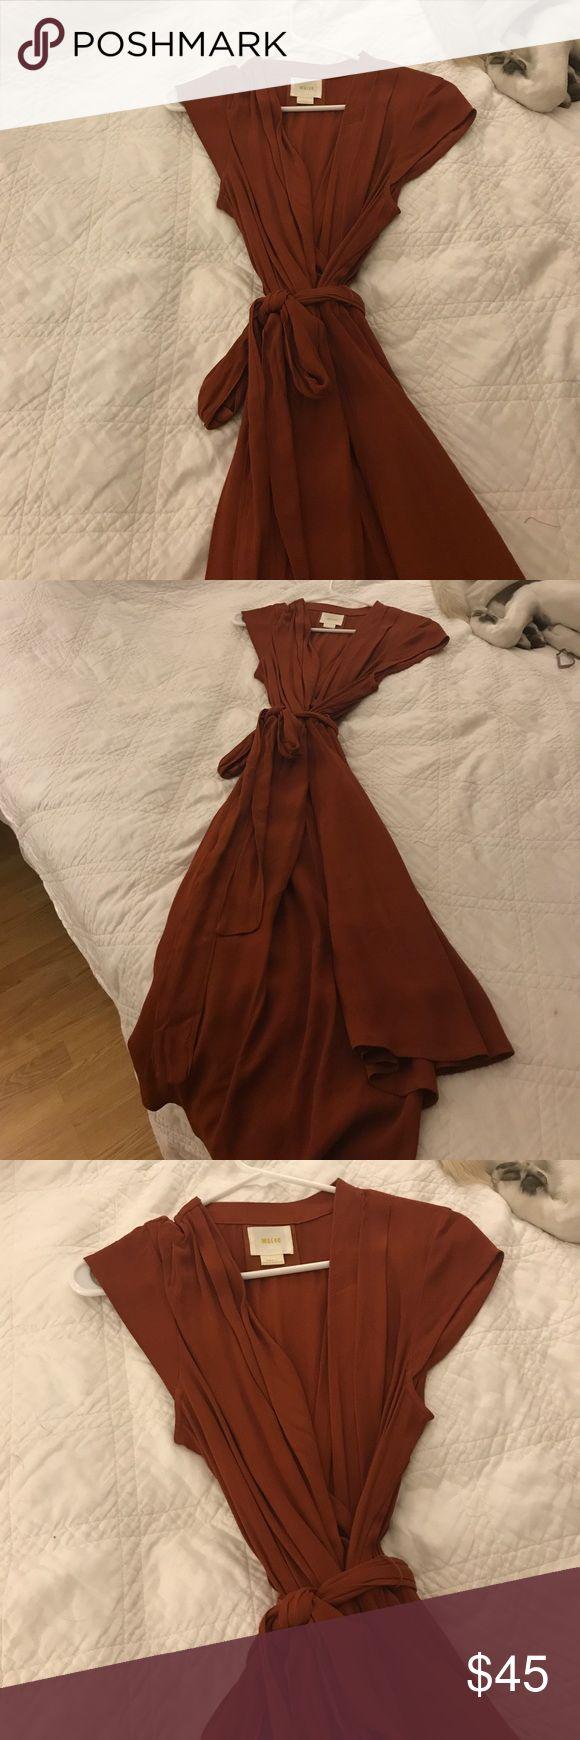 Maeve - Anthropology dress - burnt orange Maeve - Anthropology dress - burnt orange - wrap dress. Never been worn Anthropologie Dresses